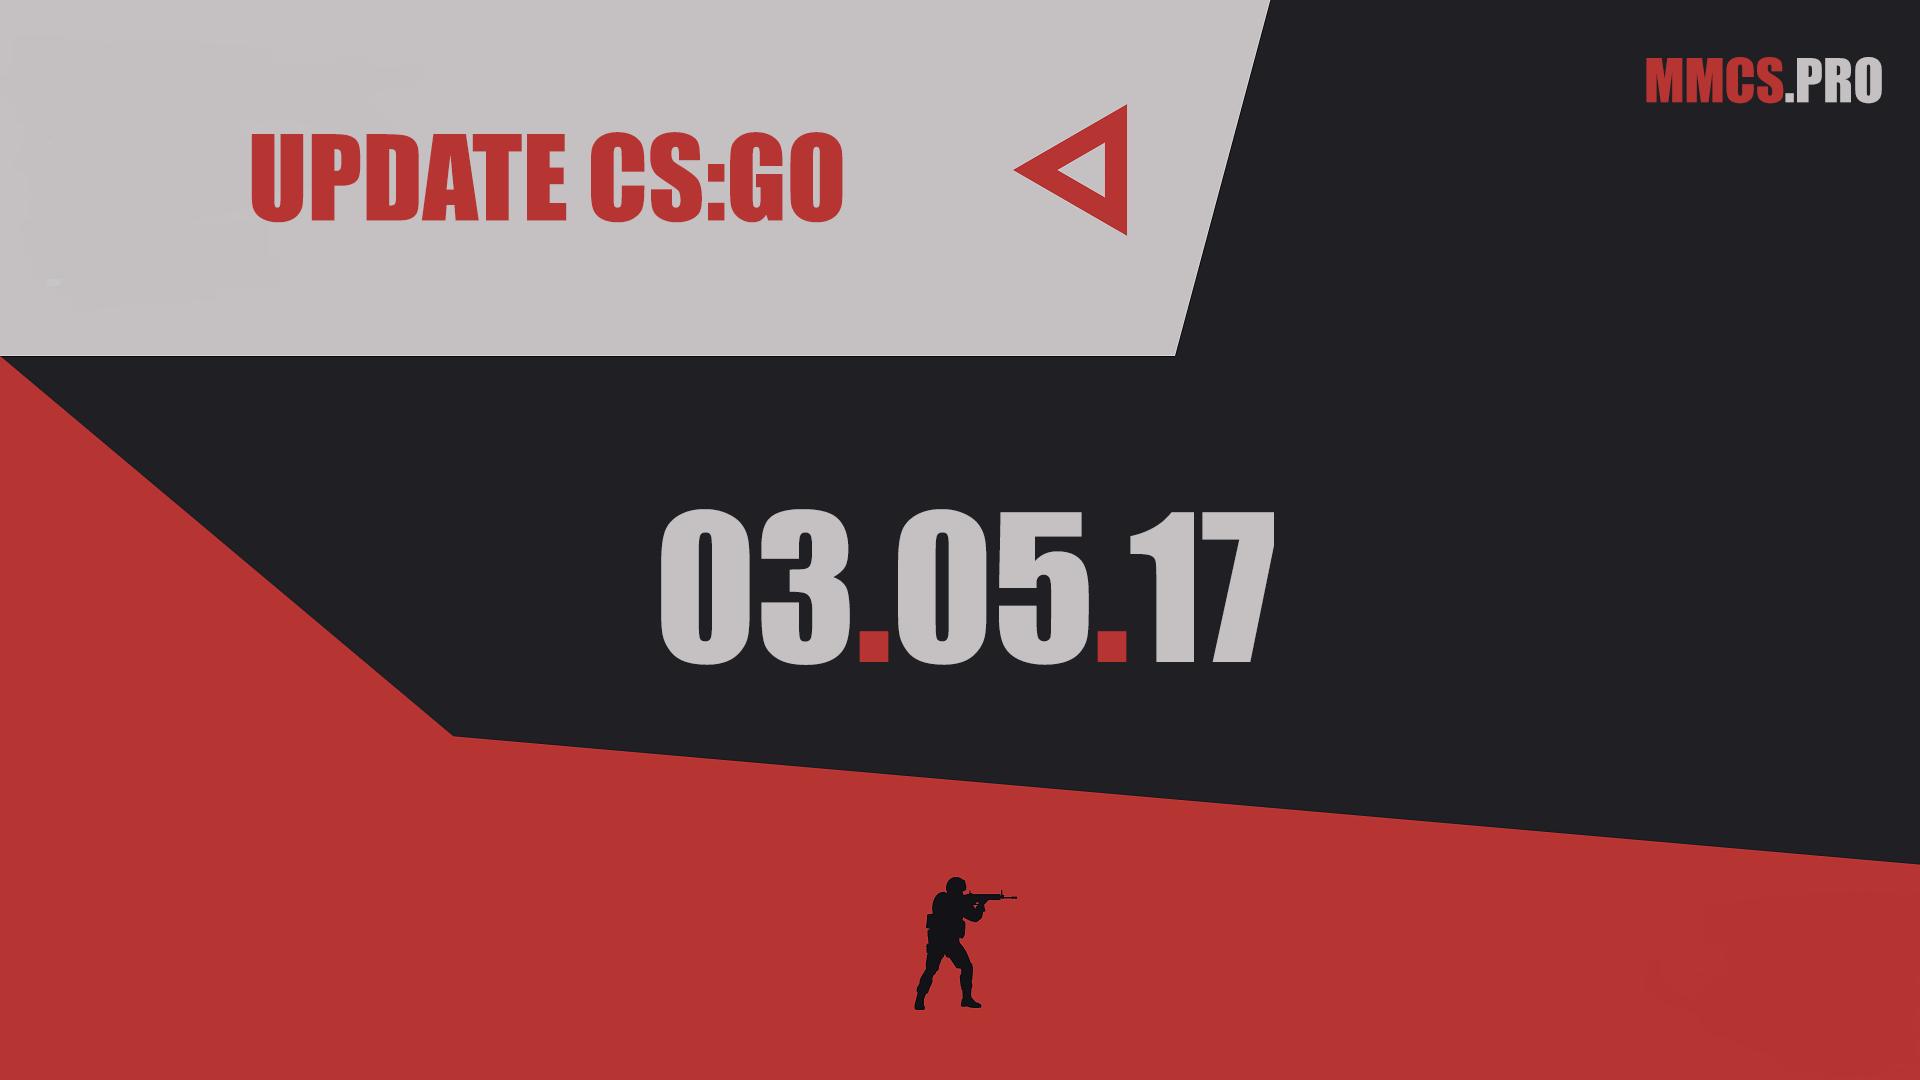 https://mmcs.pro/update-csgo-03-05-2017-valve/